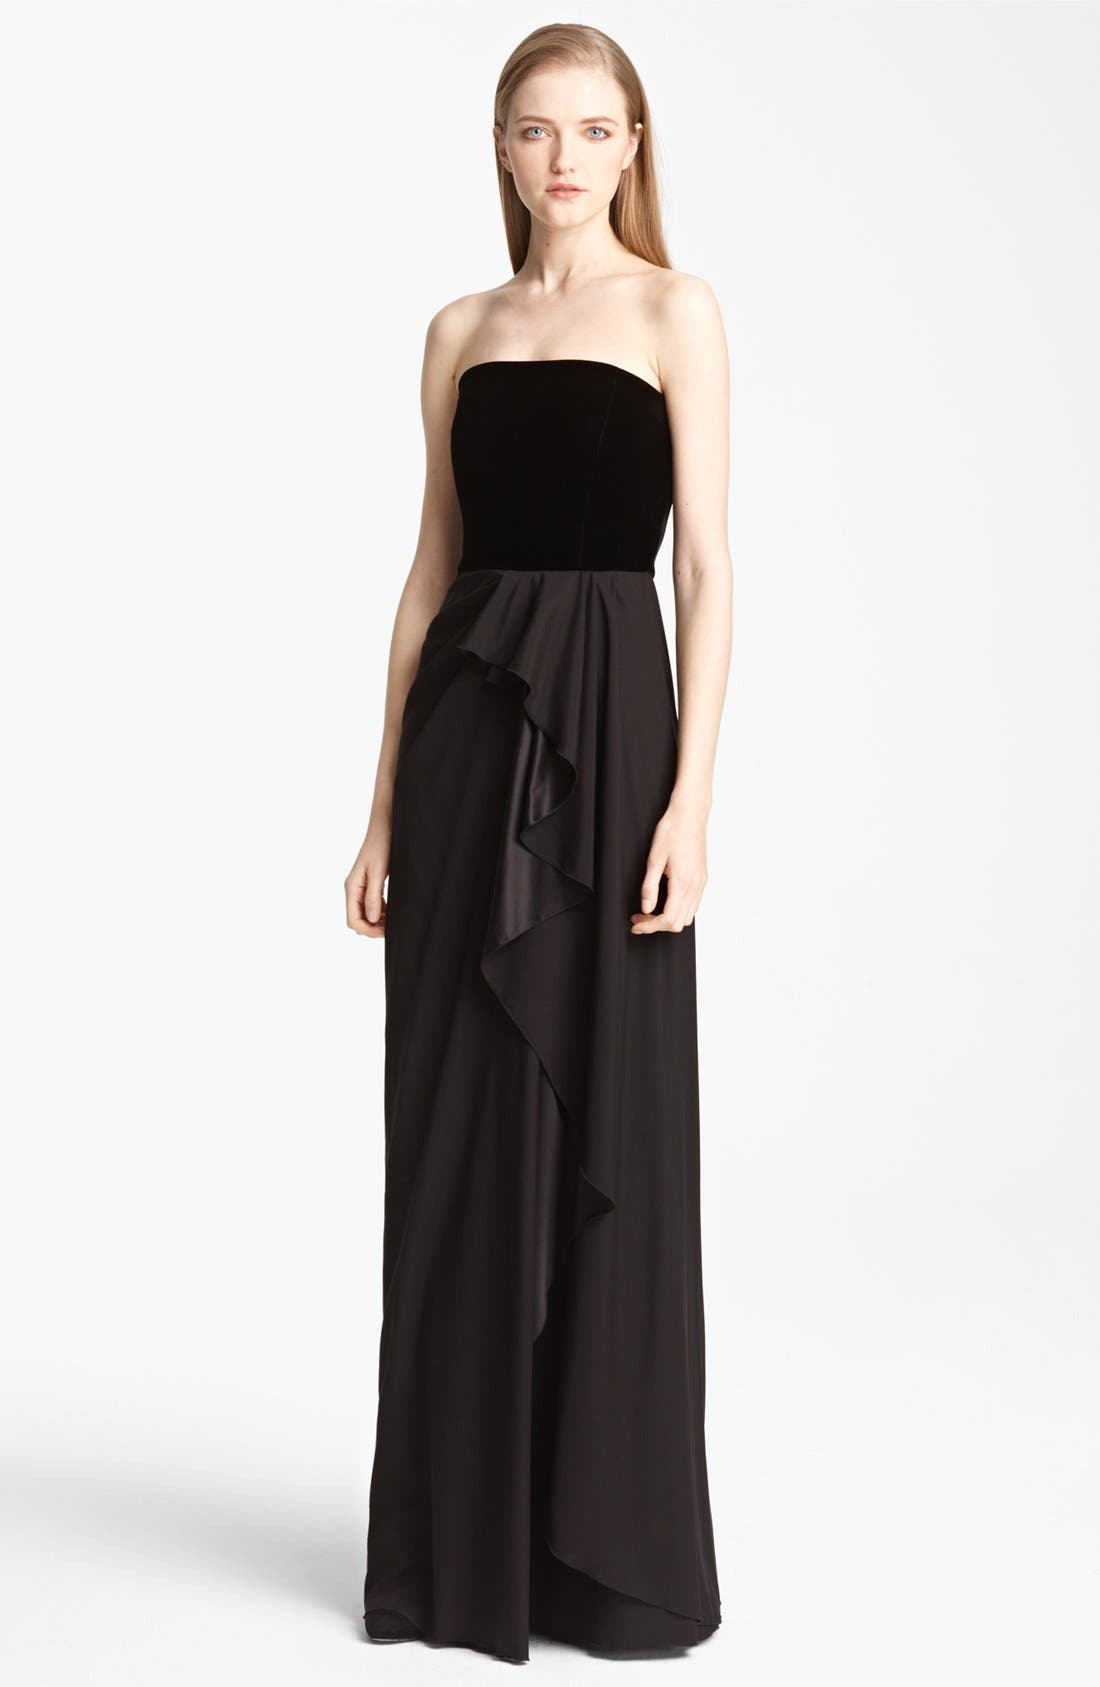 Main Image - Armani Collezioni Strapless Velvet & Chiffon Dress